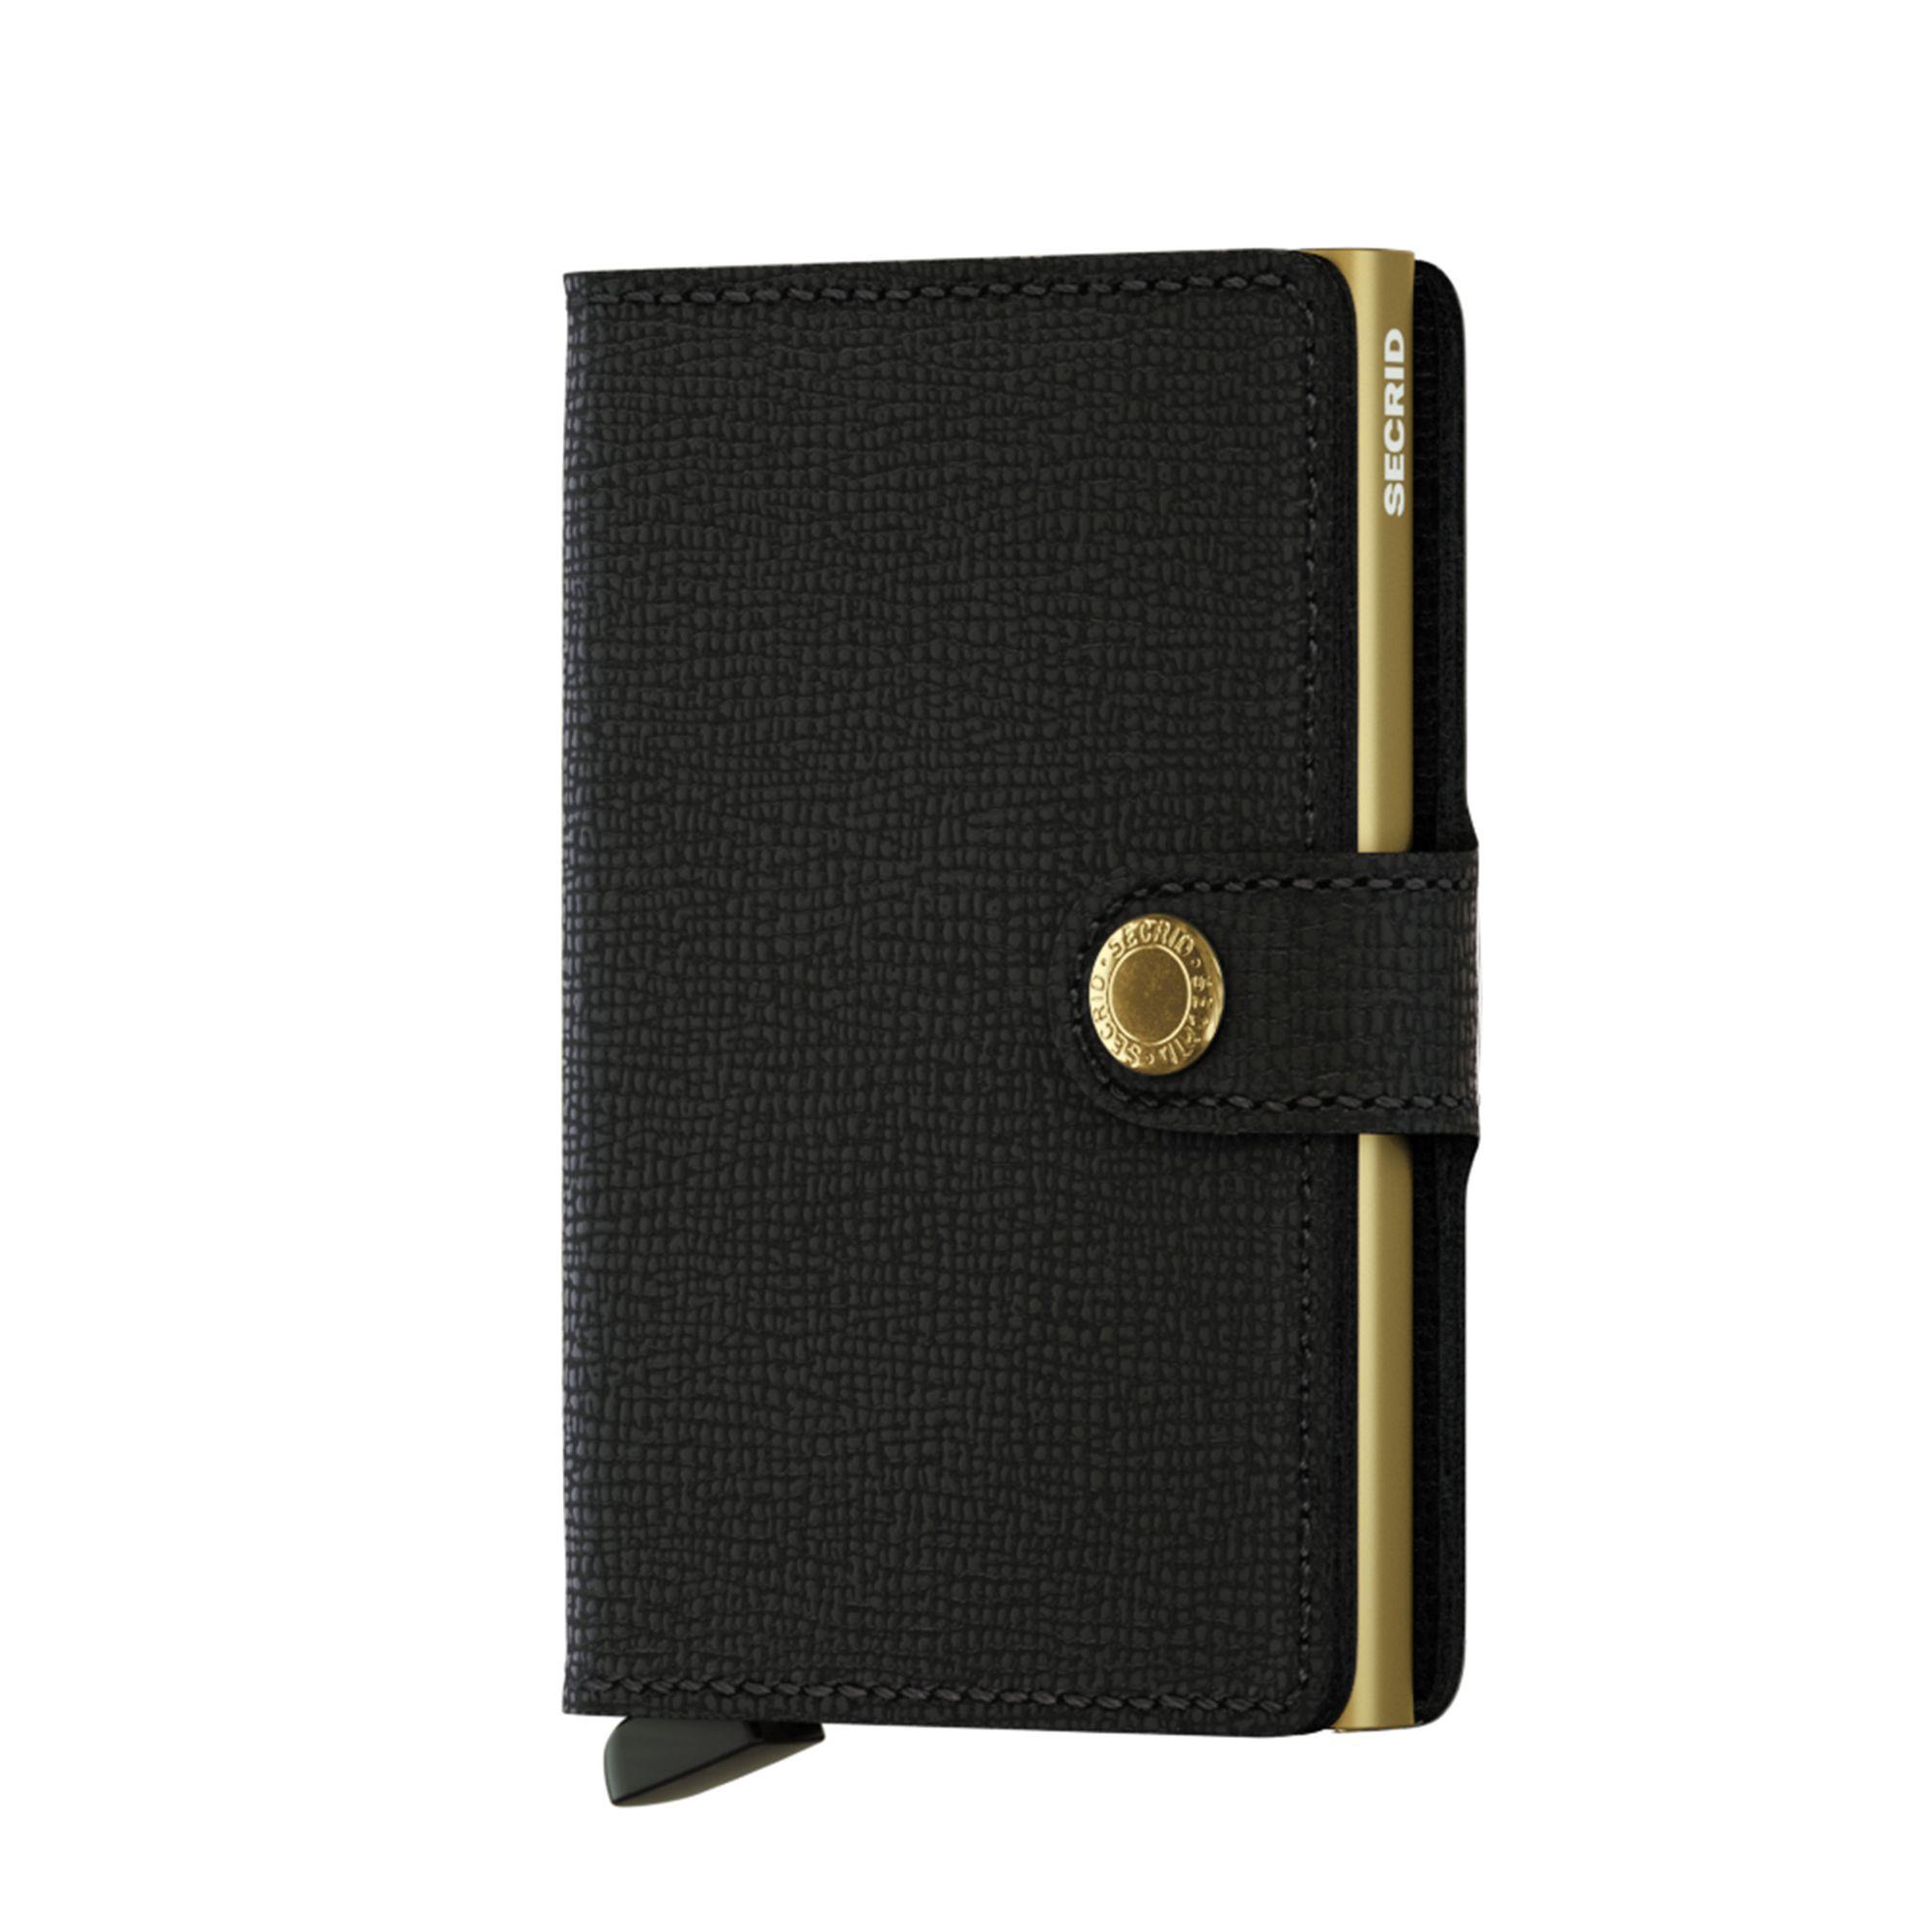 Secrid Miniwallet liten plånbok, Svart